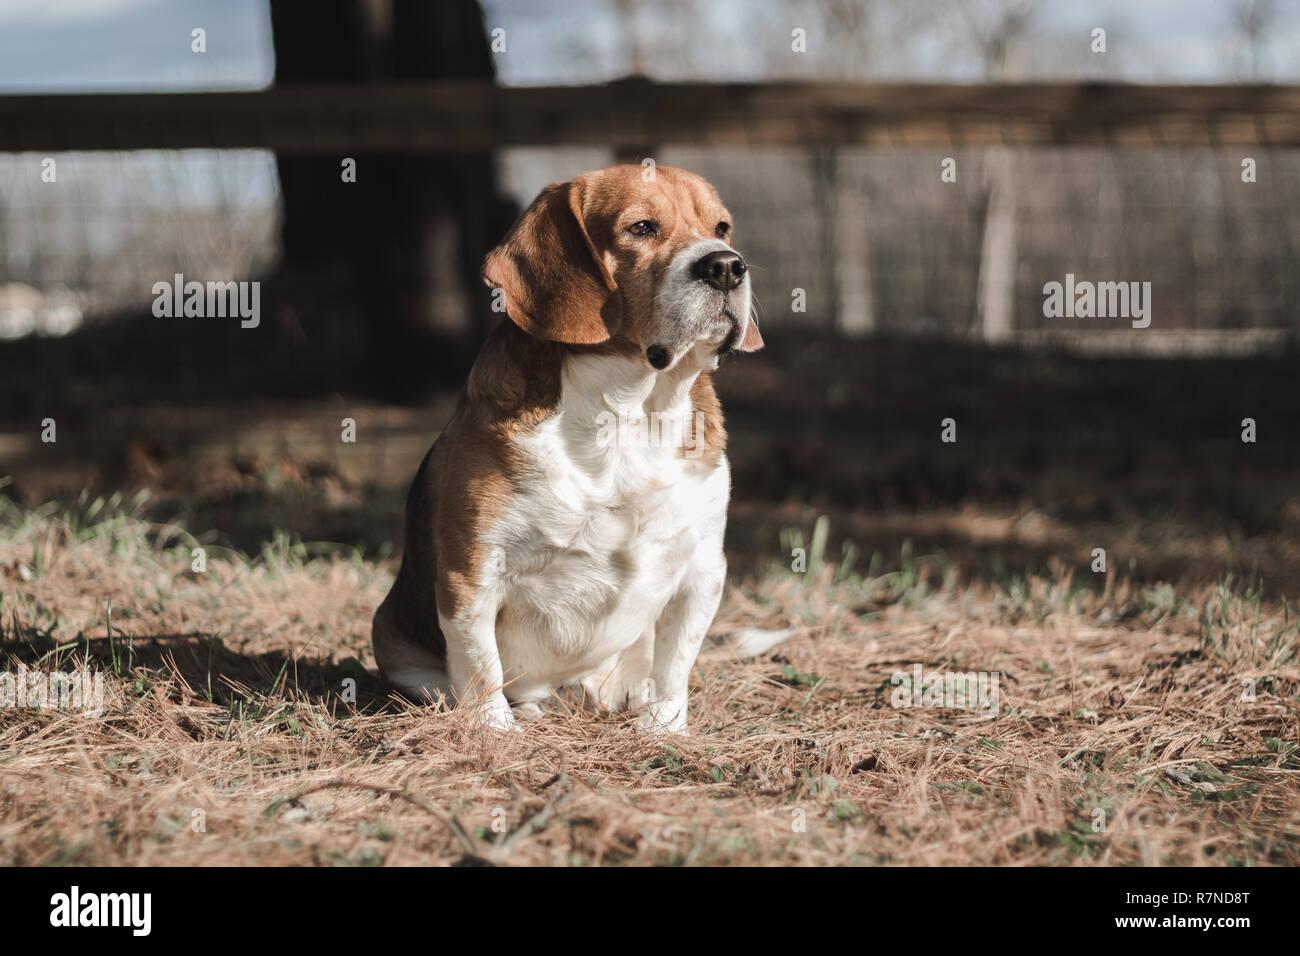 a cute beagle posing, naturally - Stock Image